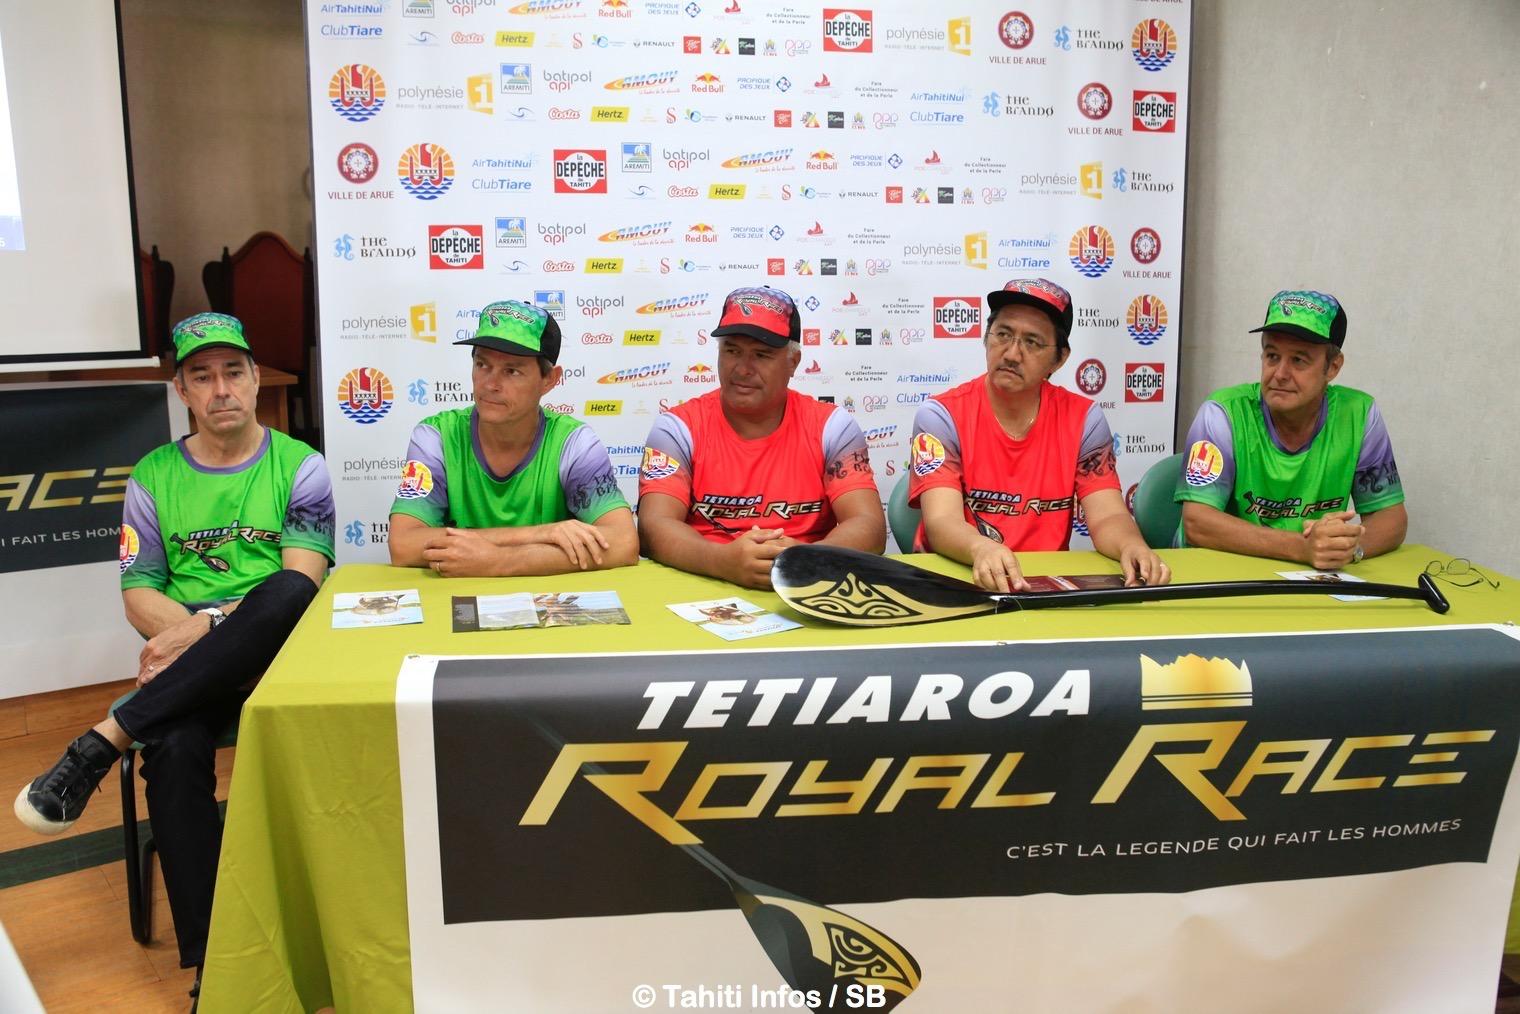 Va'a V6 – Tetiaroa Royal Race : Une course hors norme